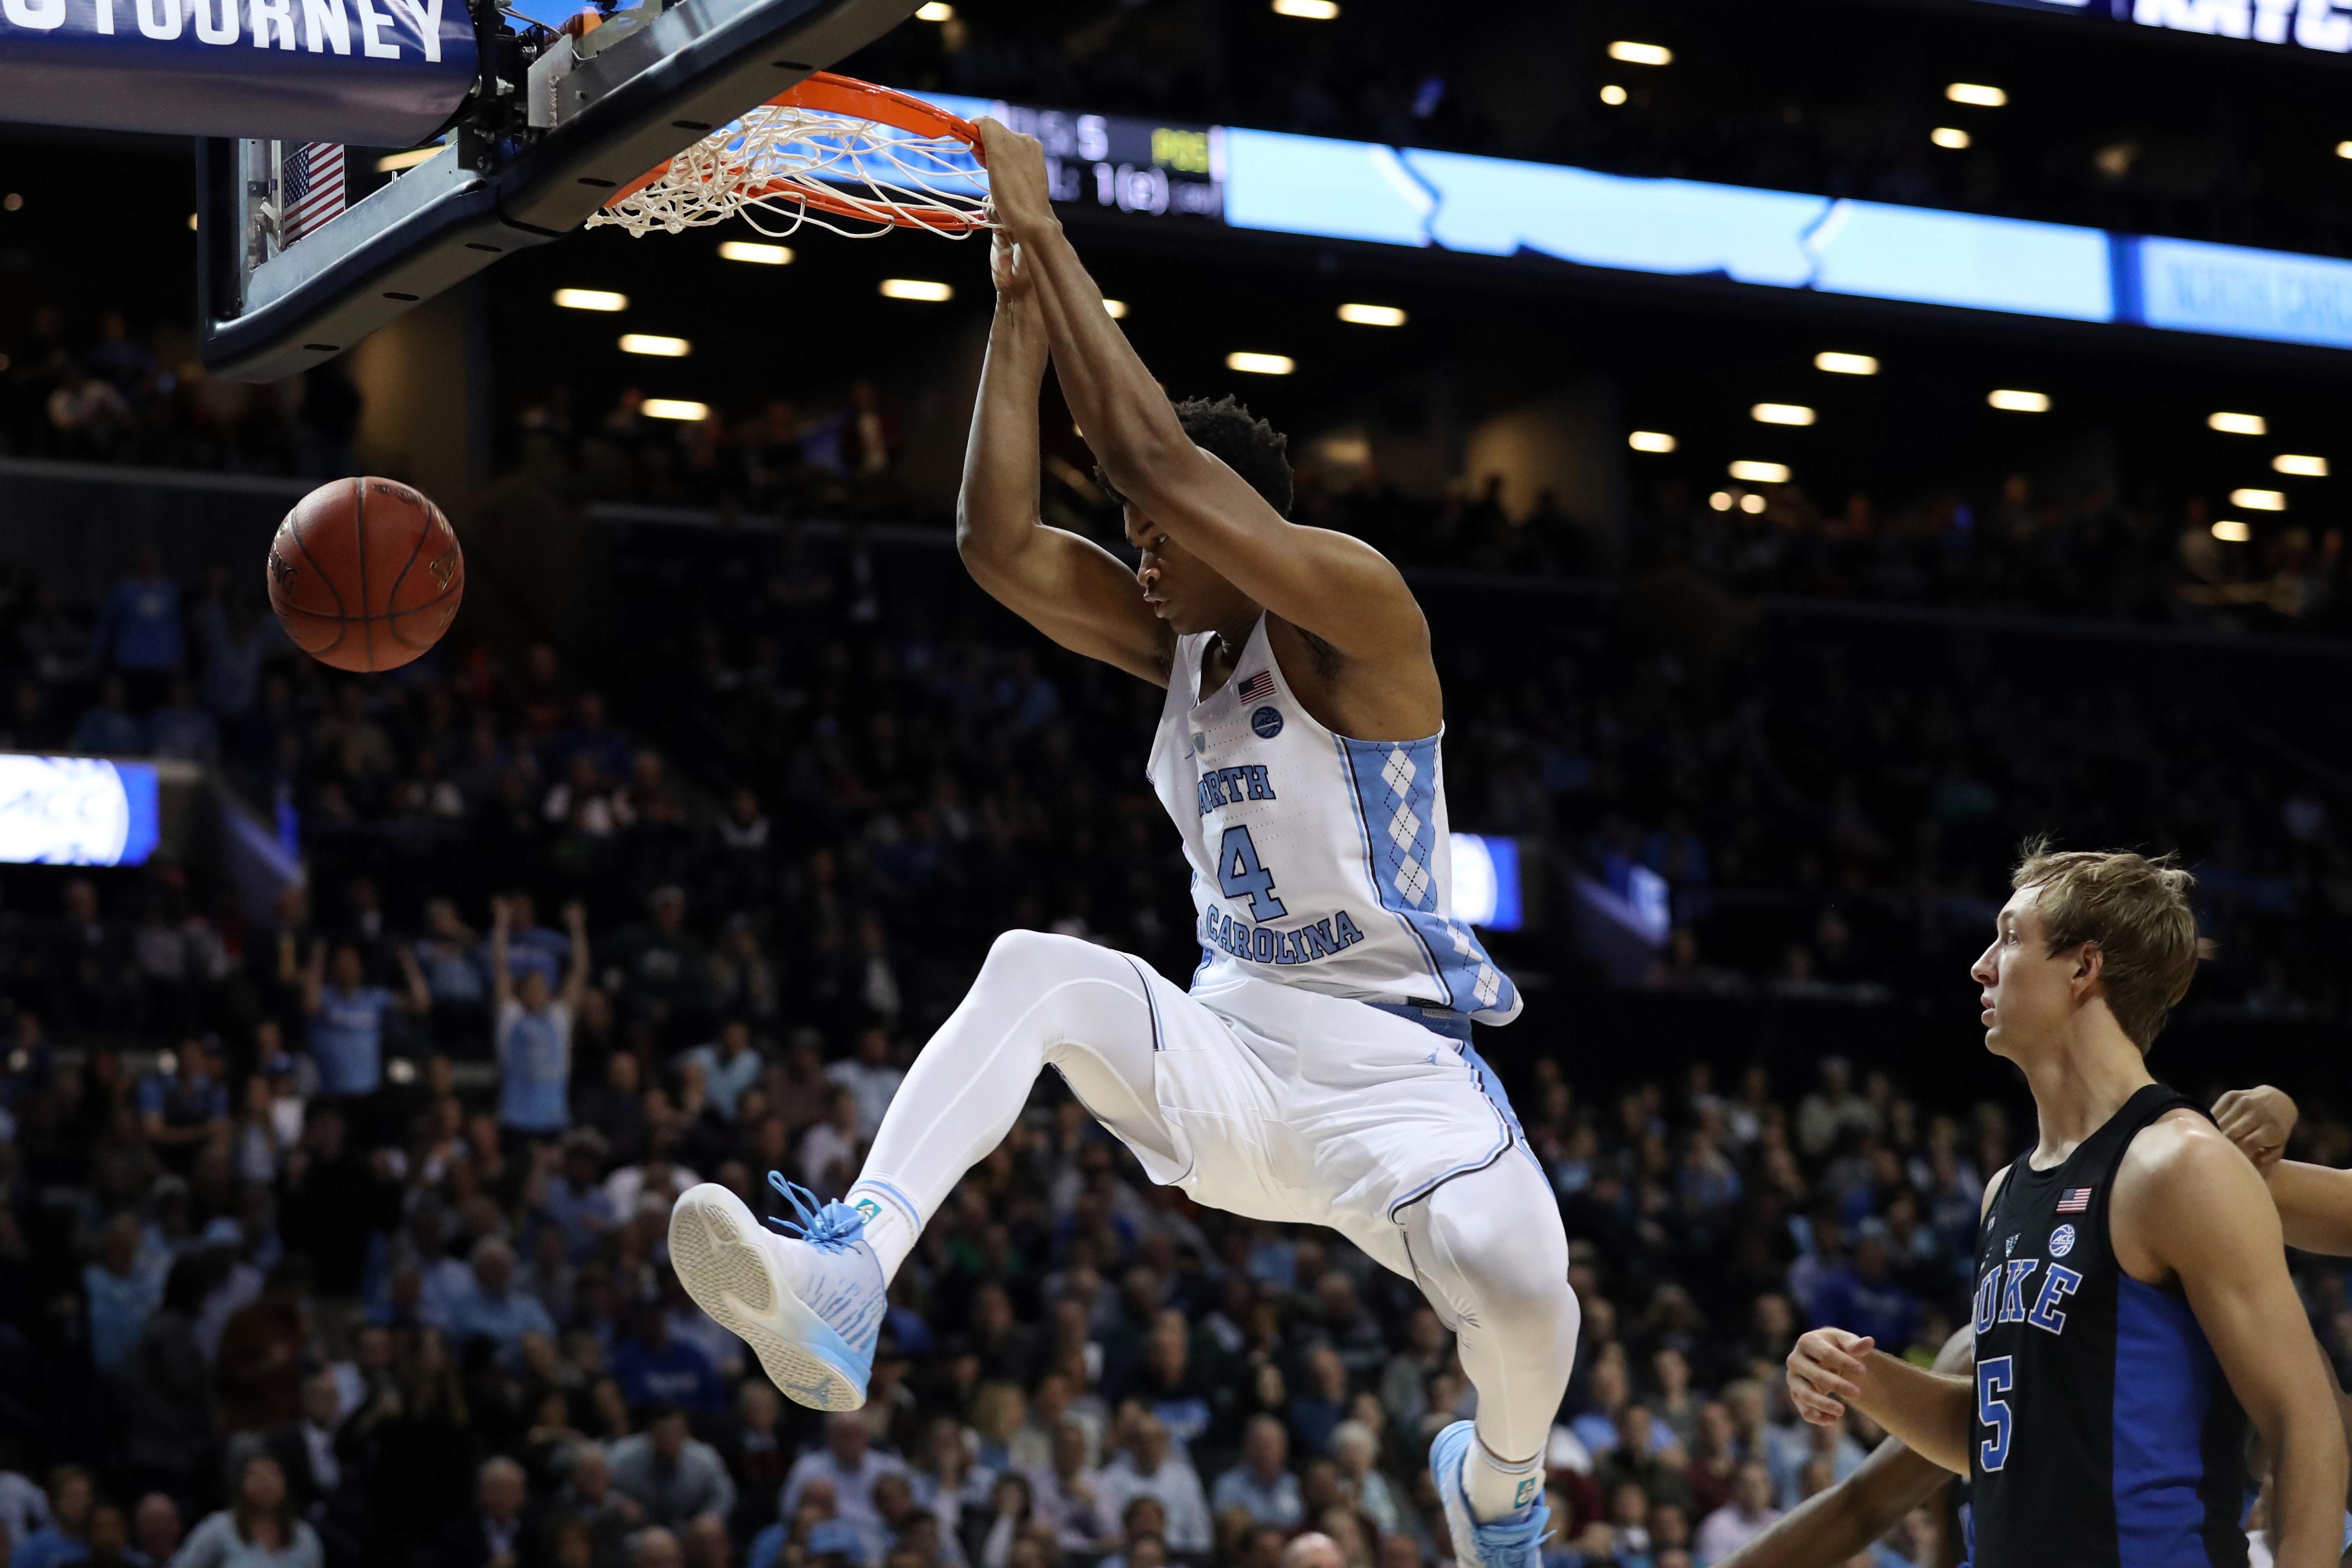 9932374-ncaa-basketball-acc-conference-tournament-north-carolina-vs-duke